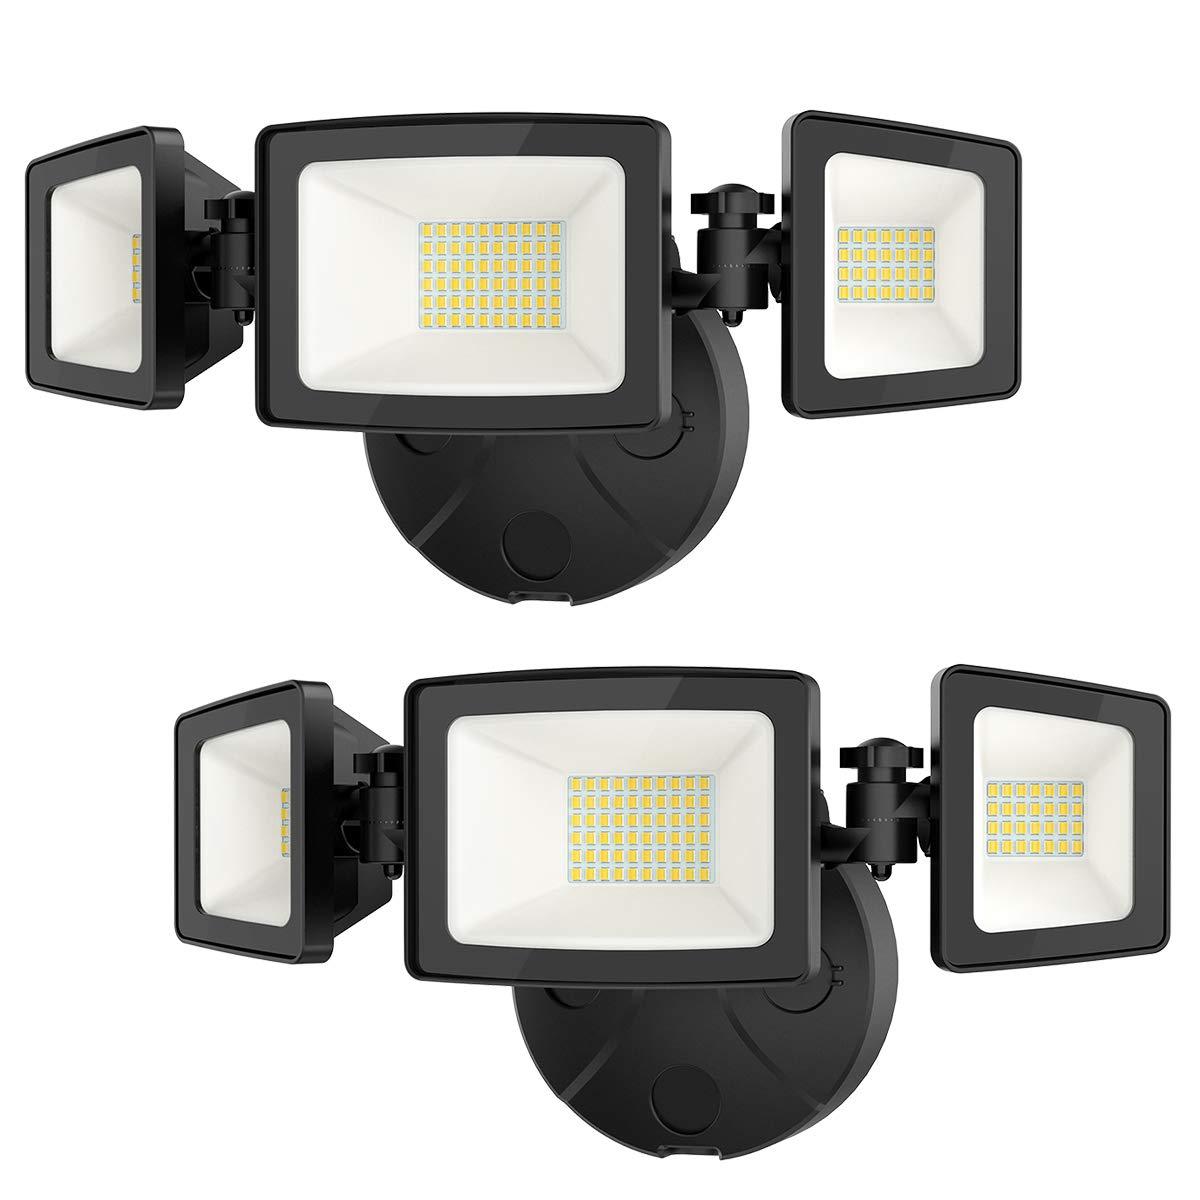 Onforu 2 Pack 50W LED Security Light, 5000LM